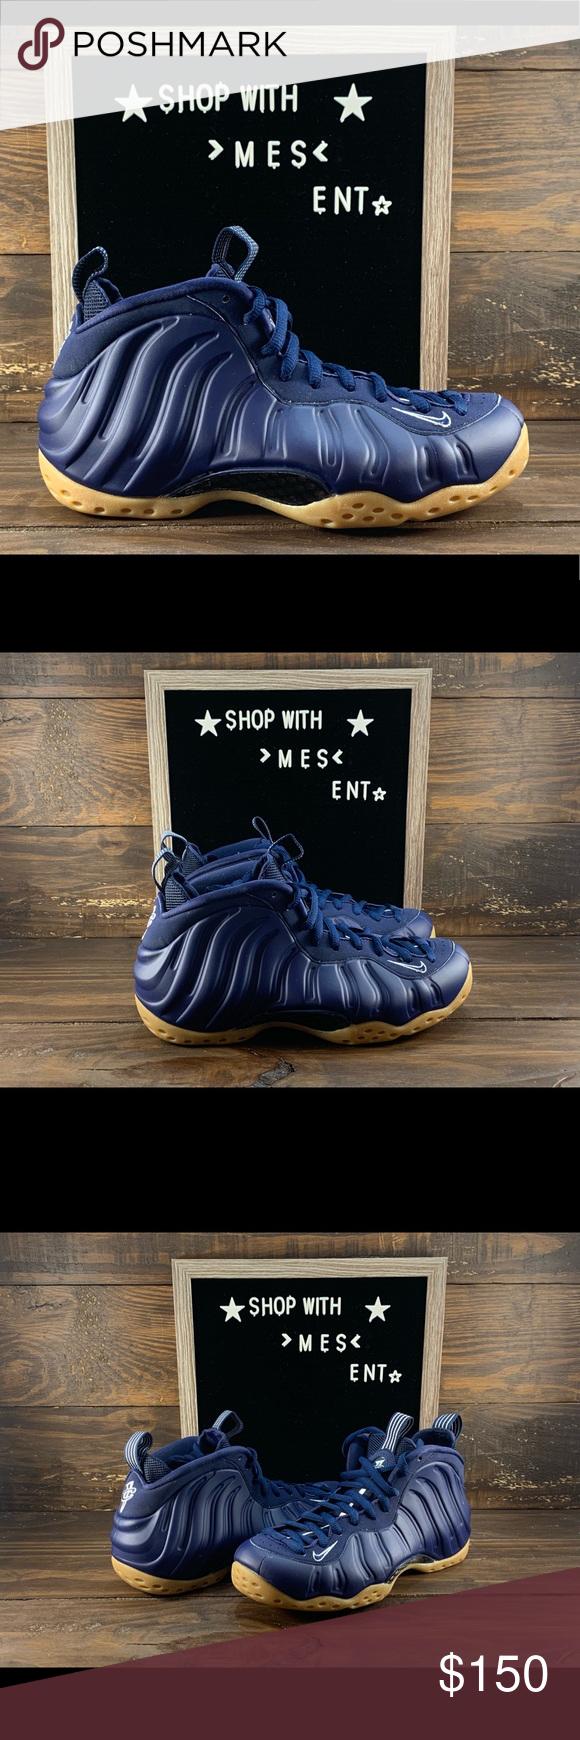 Nike Womens Air Foamposite One USA ShoesSize 8W ...